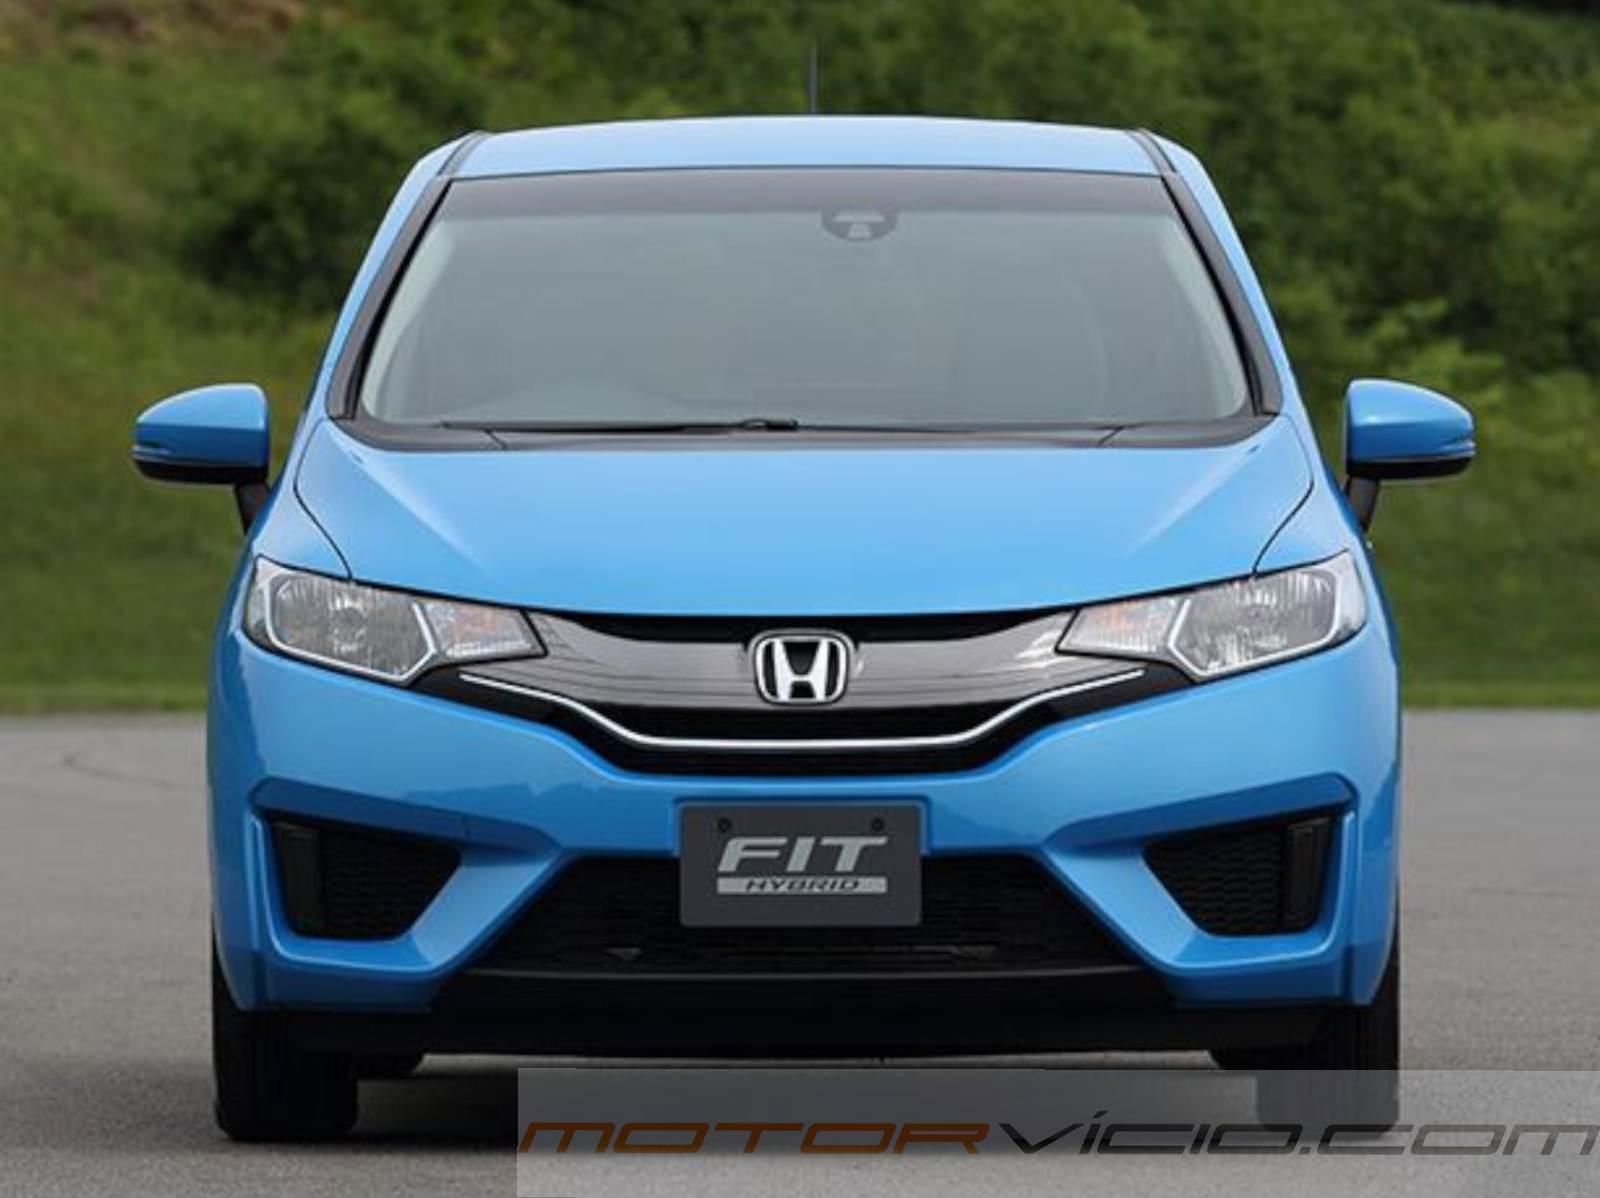 2014 Honda Jazz / Honda Fit